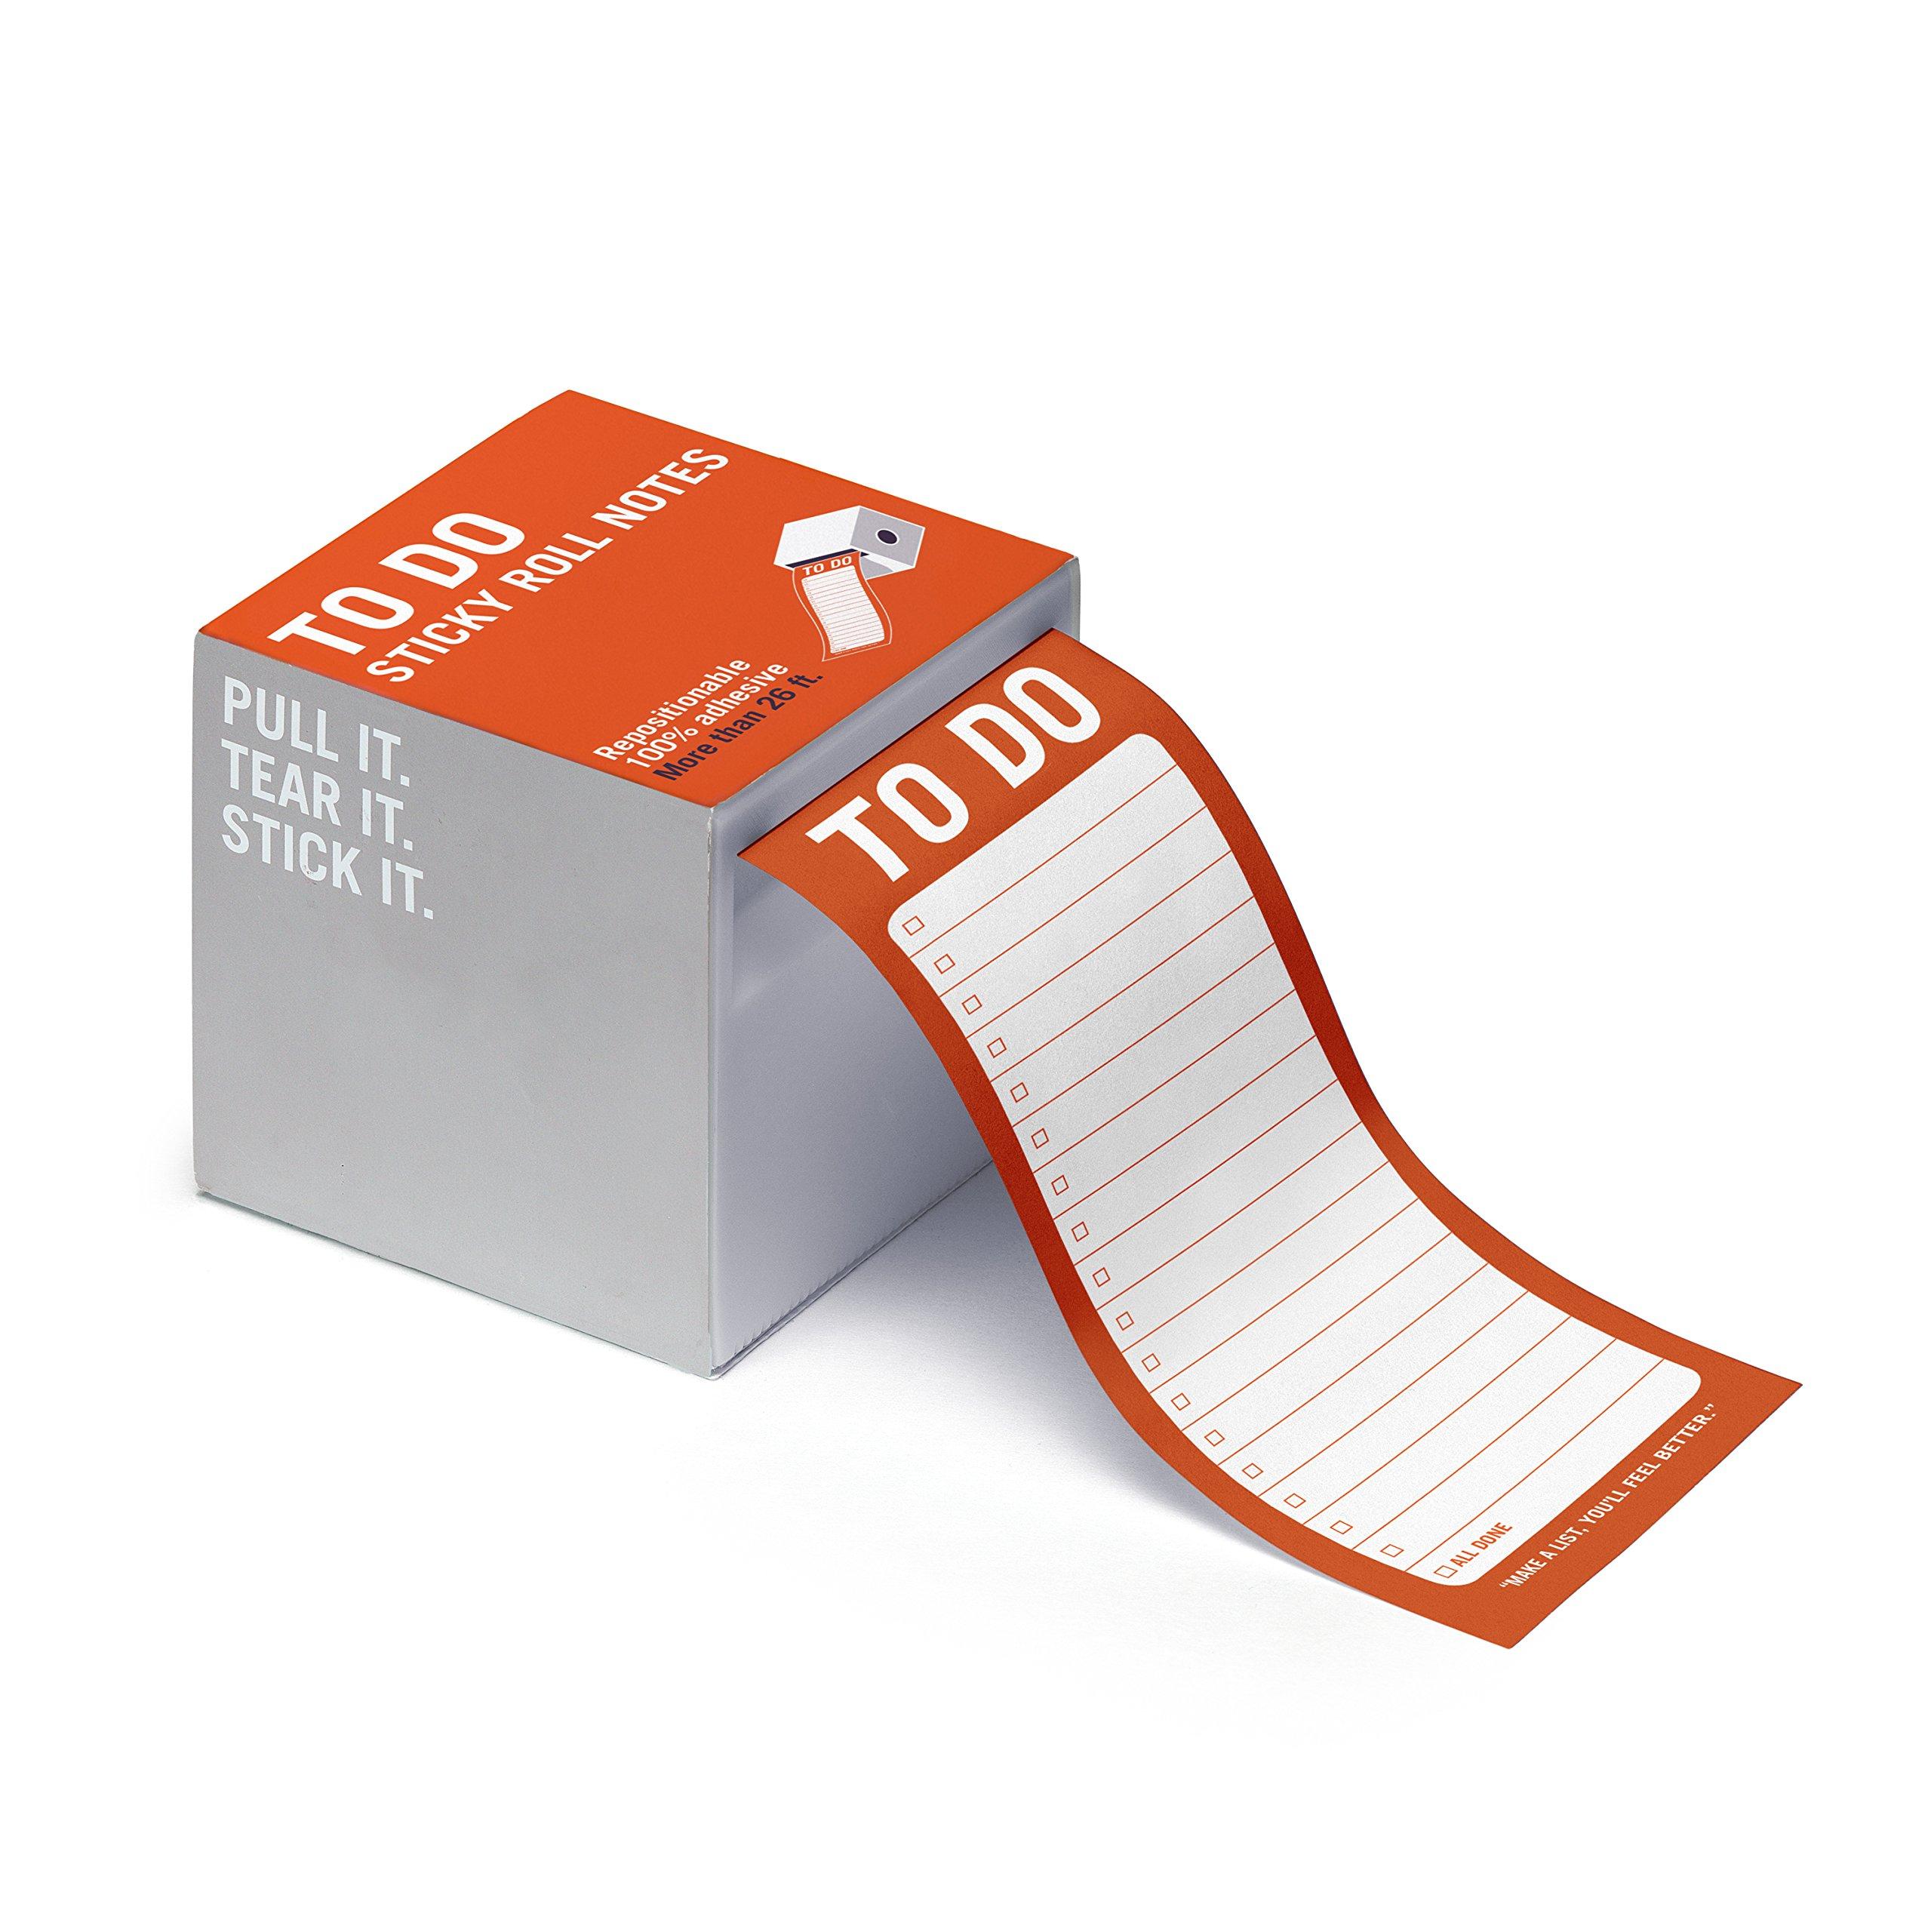 Knock Knock To Do Sticky Roll Notes PDF ePub ebook